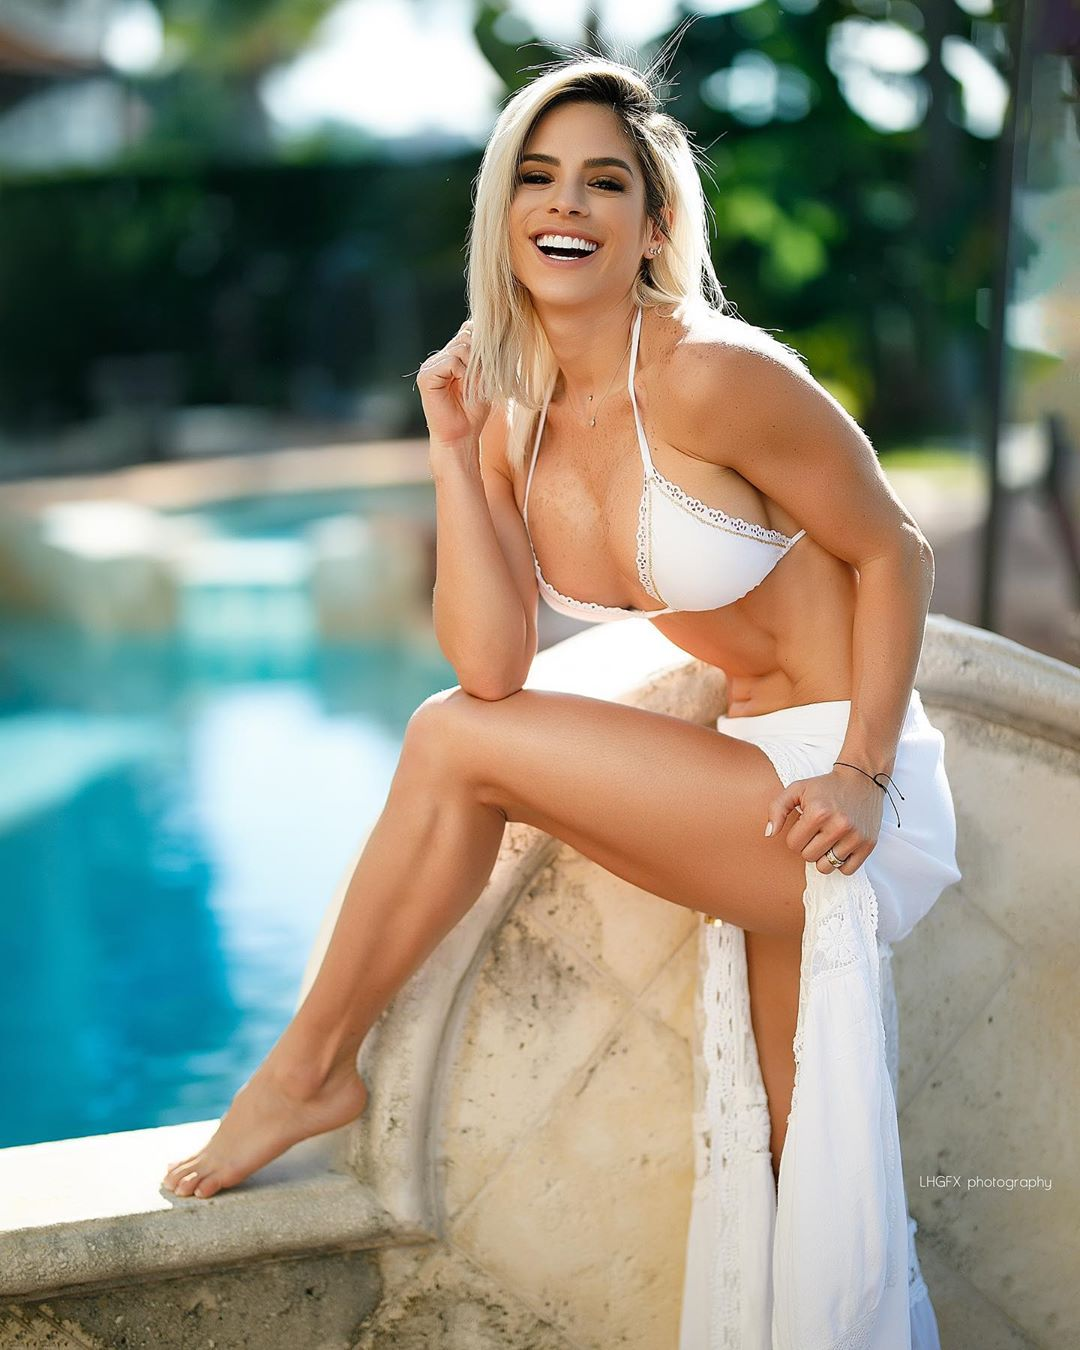 Amara Actriz Porno michelle lewin porn pic - eporner